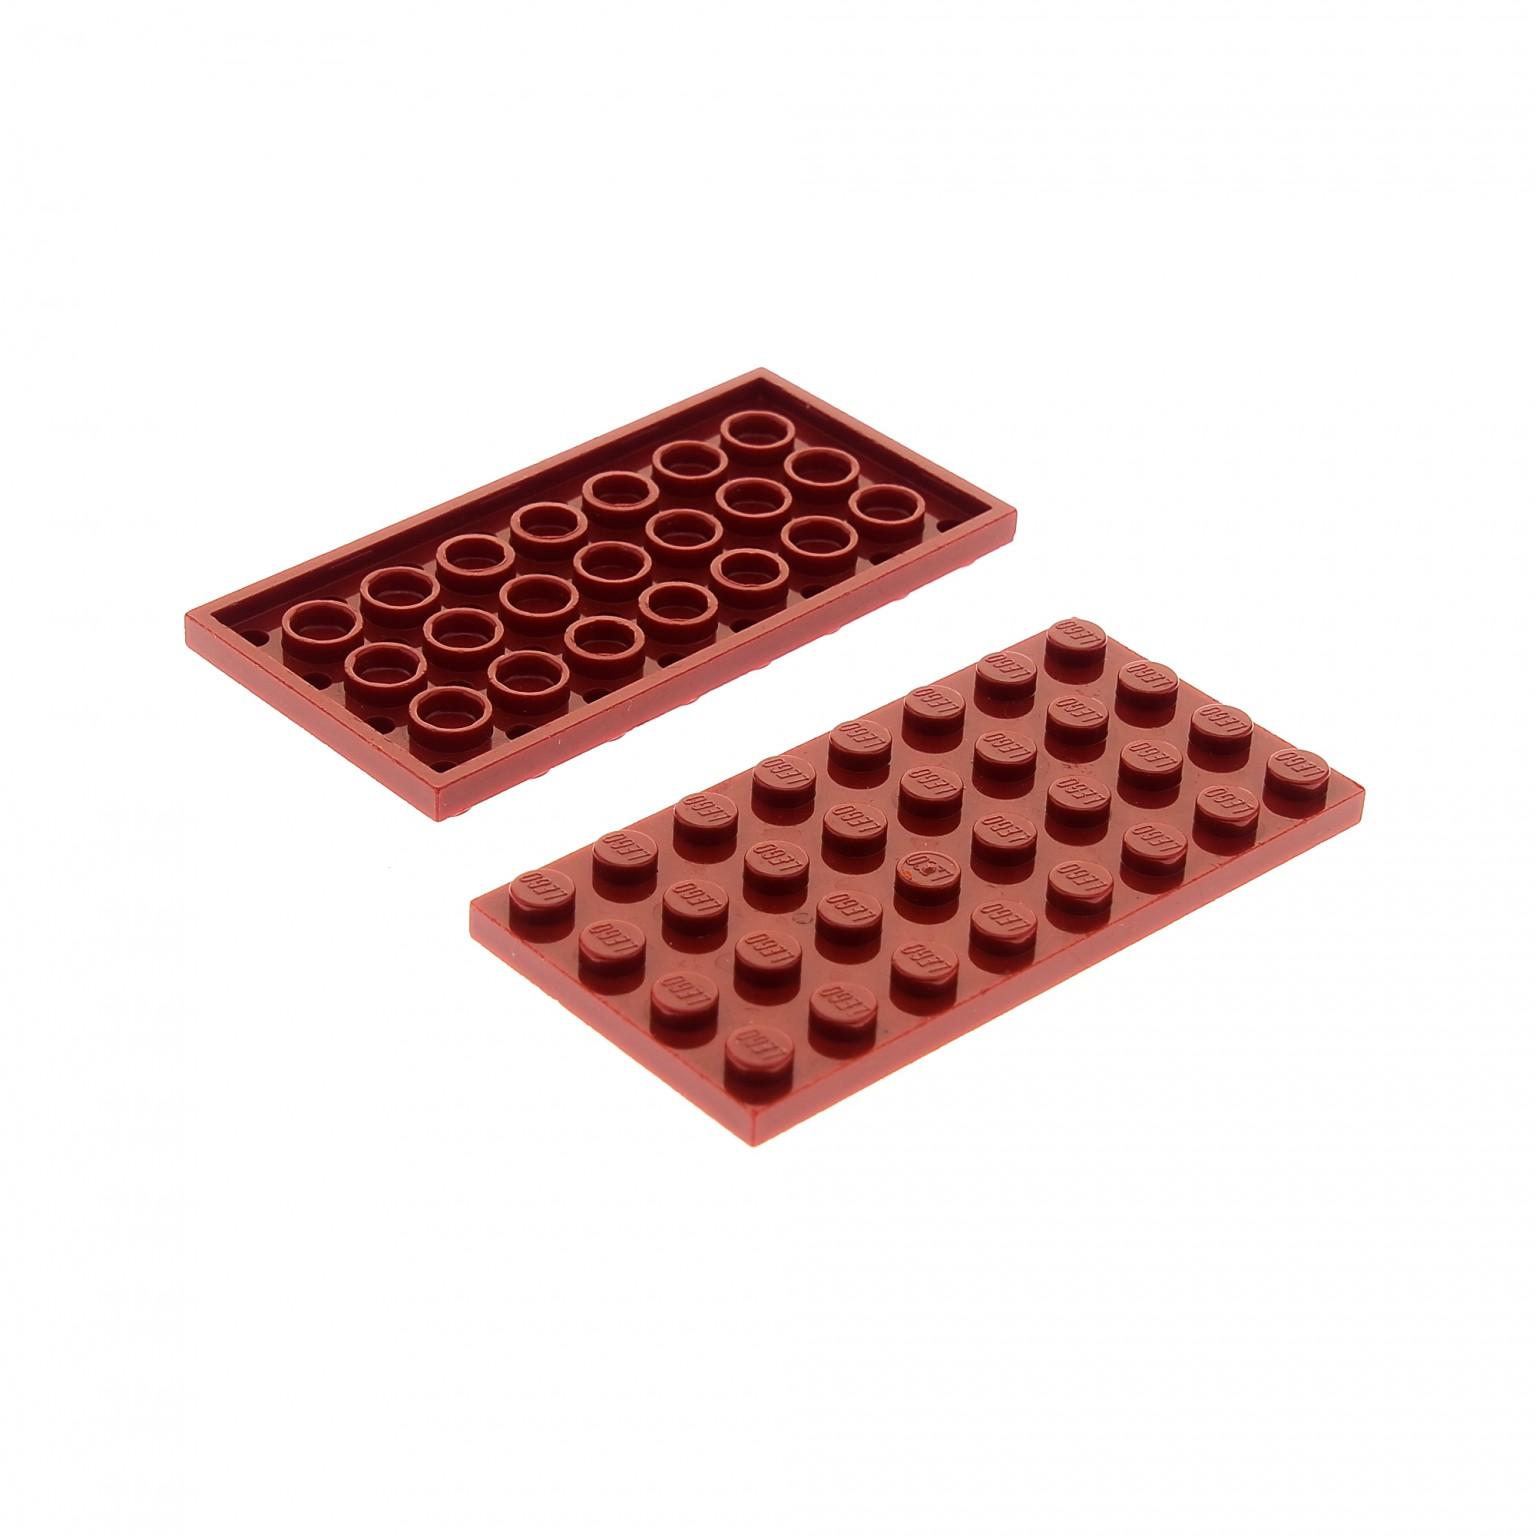 Lego 4 x Platte 3035  rot  4x8